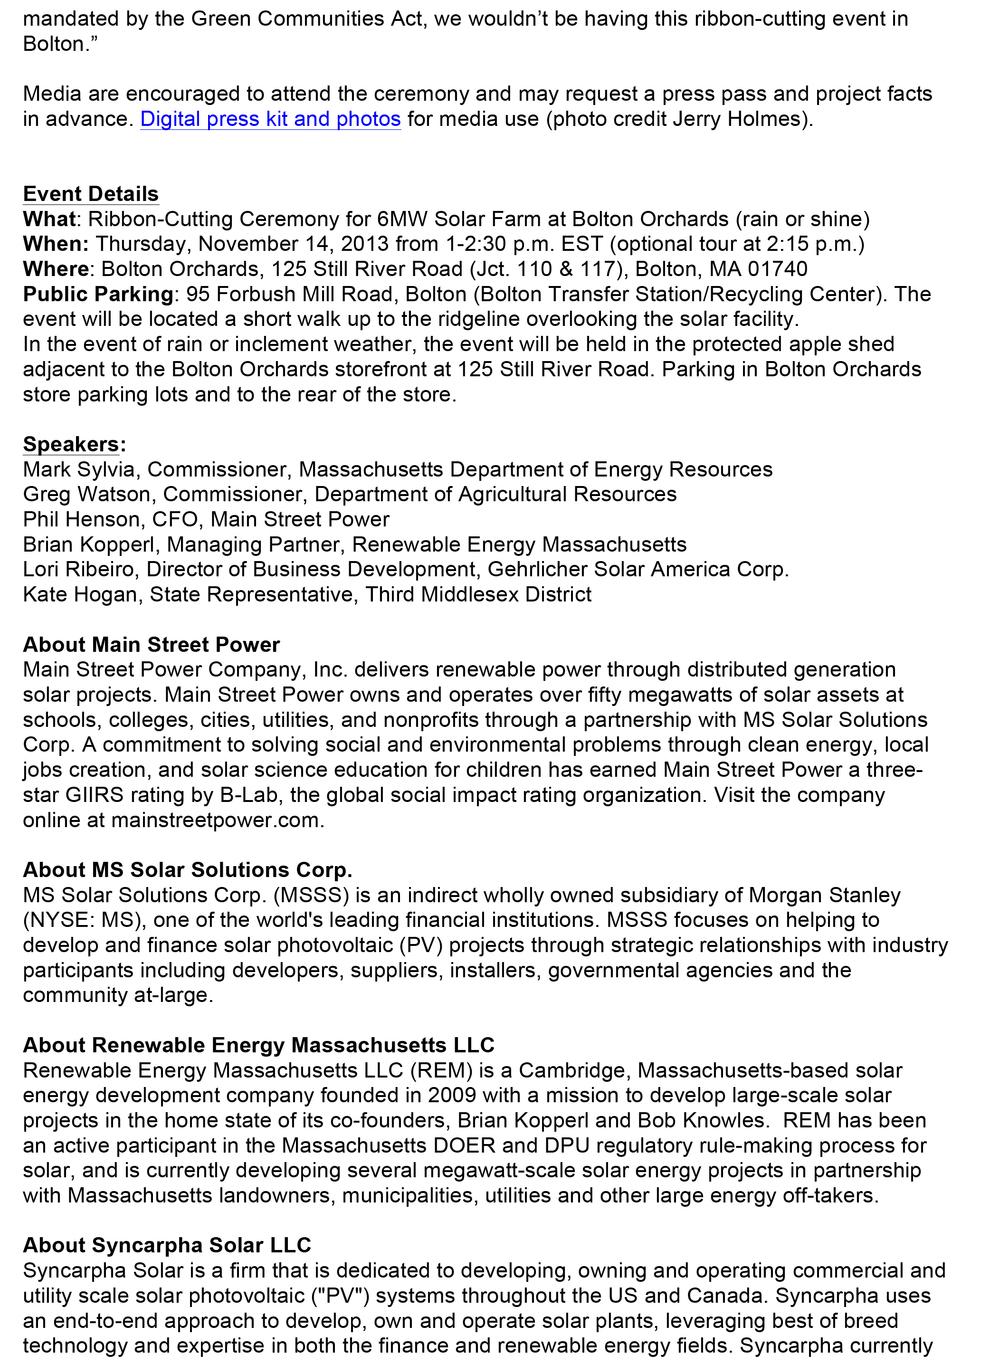 Bolton-Press-Release-11.12--2.jpg